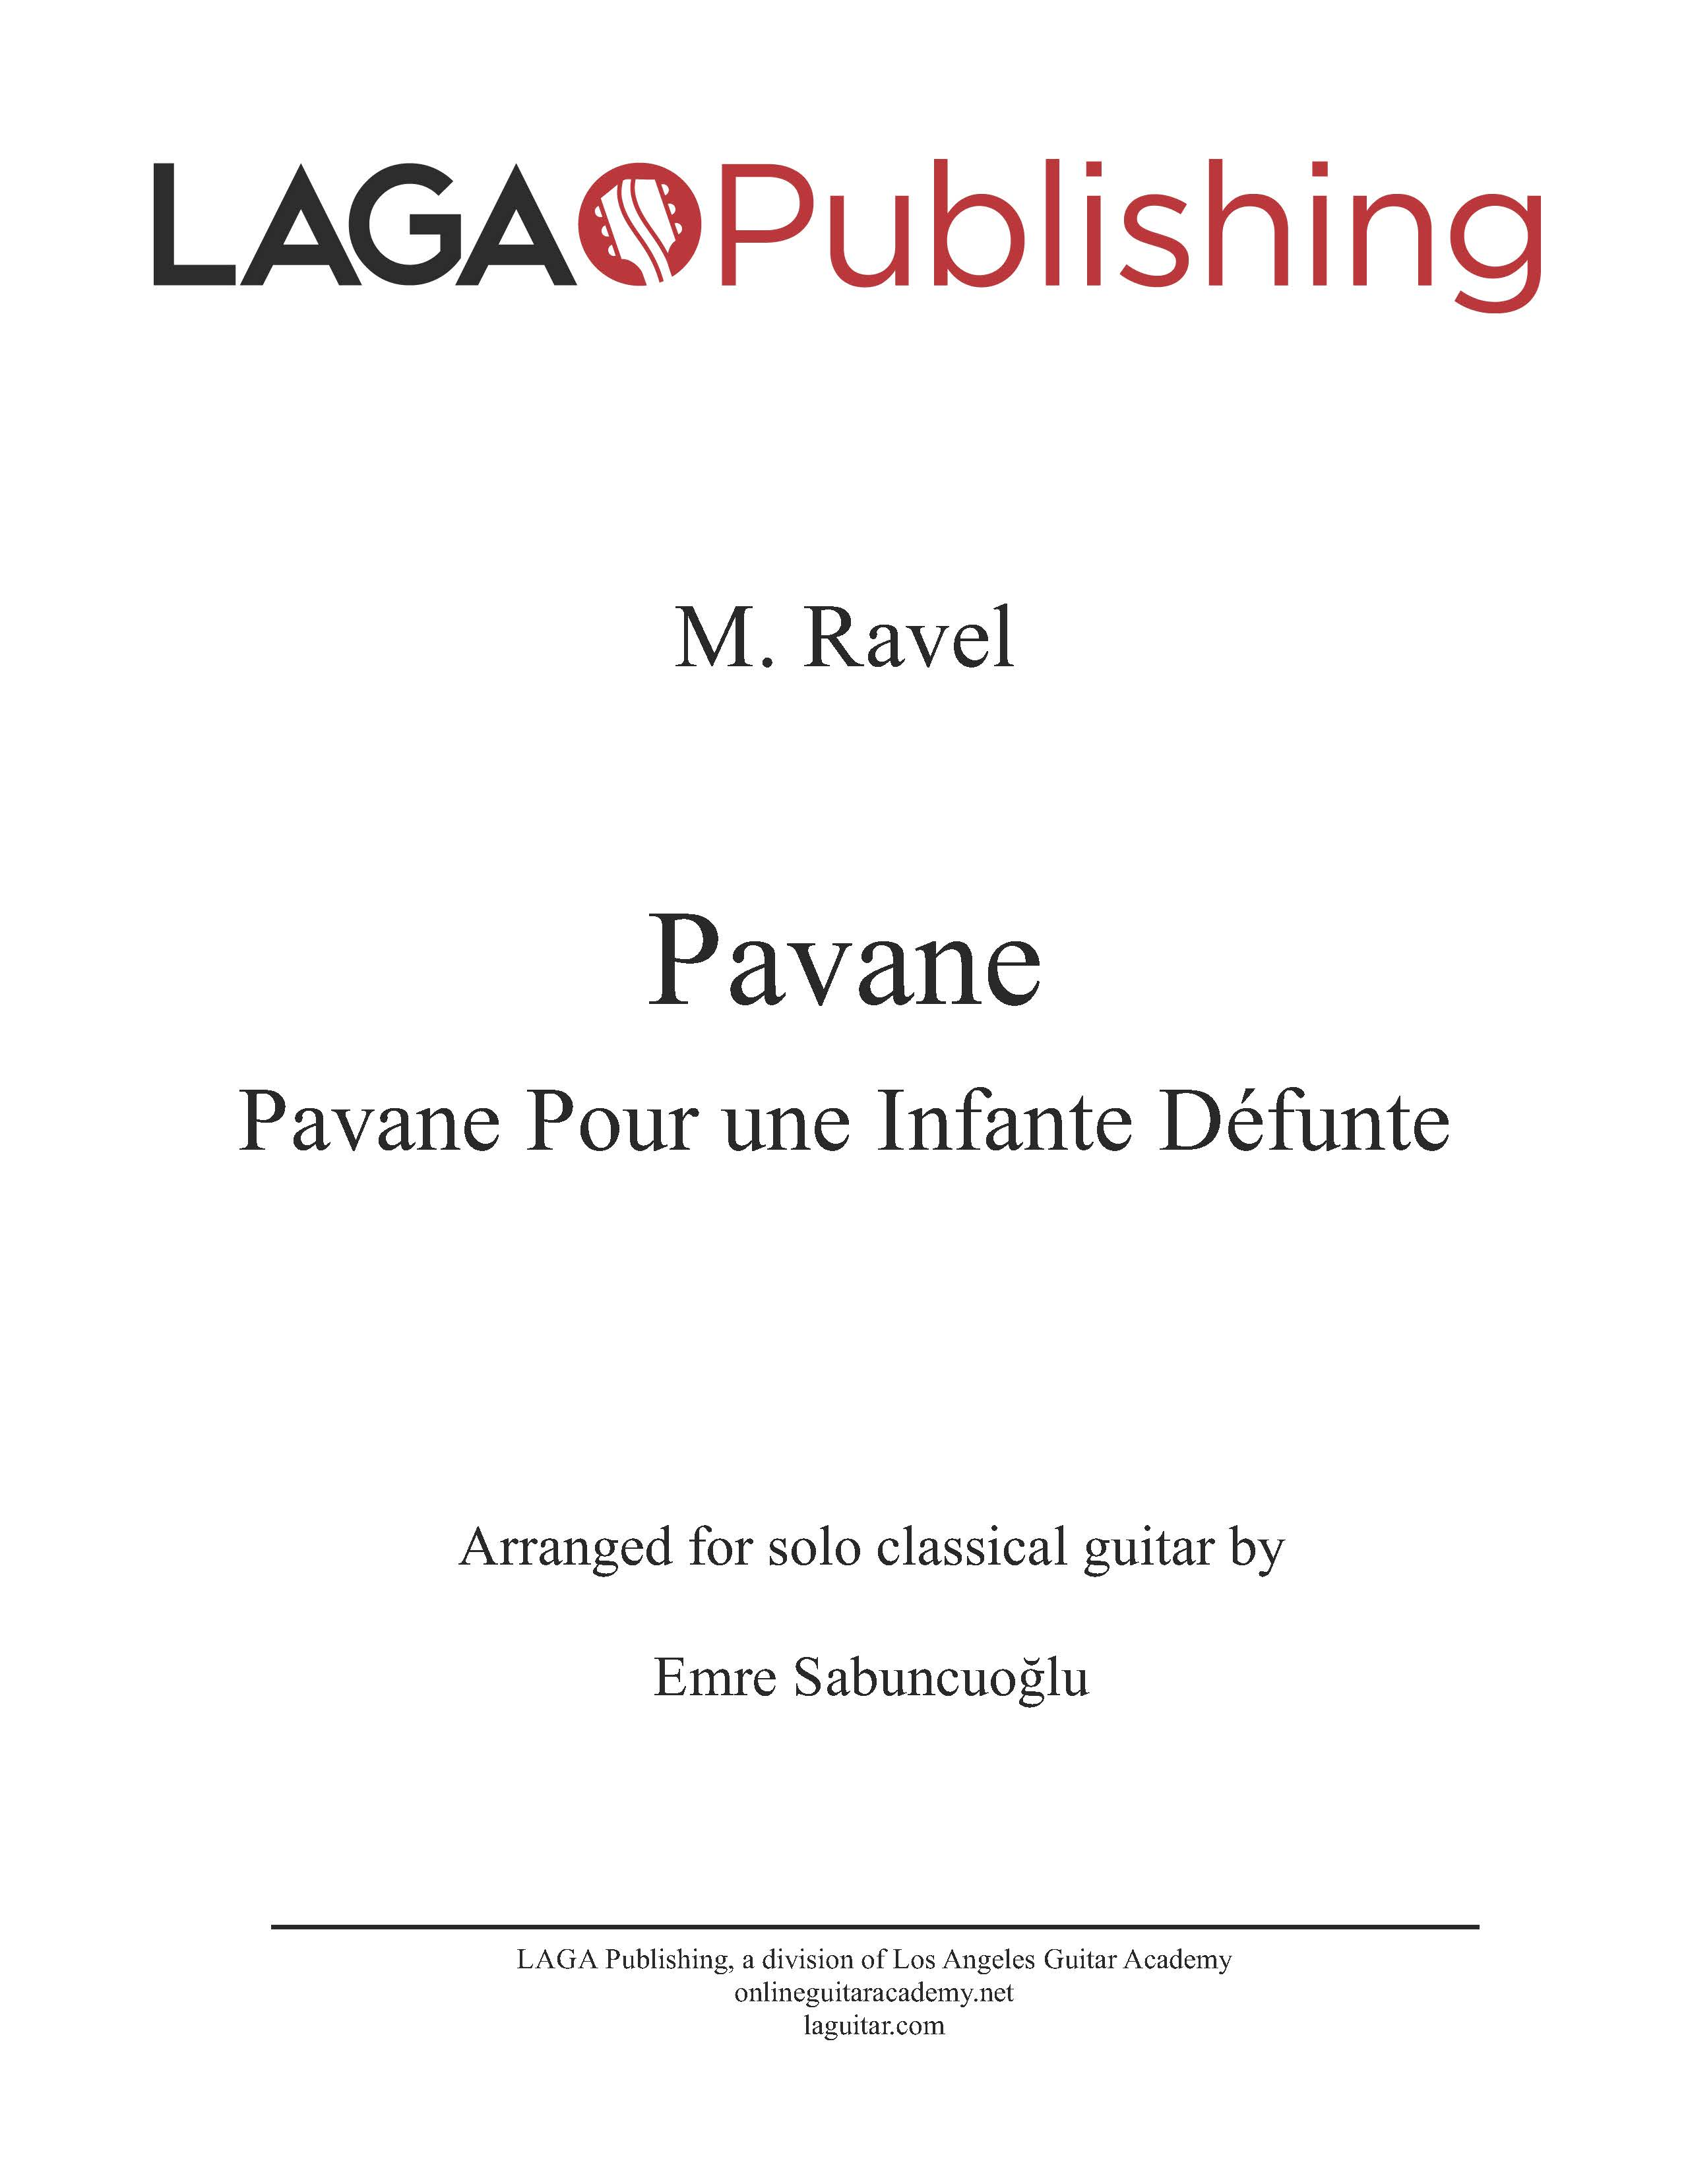 LAGA-Publishing-Ravel-Pavane-Score-and-Tab